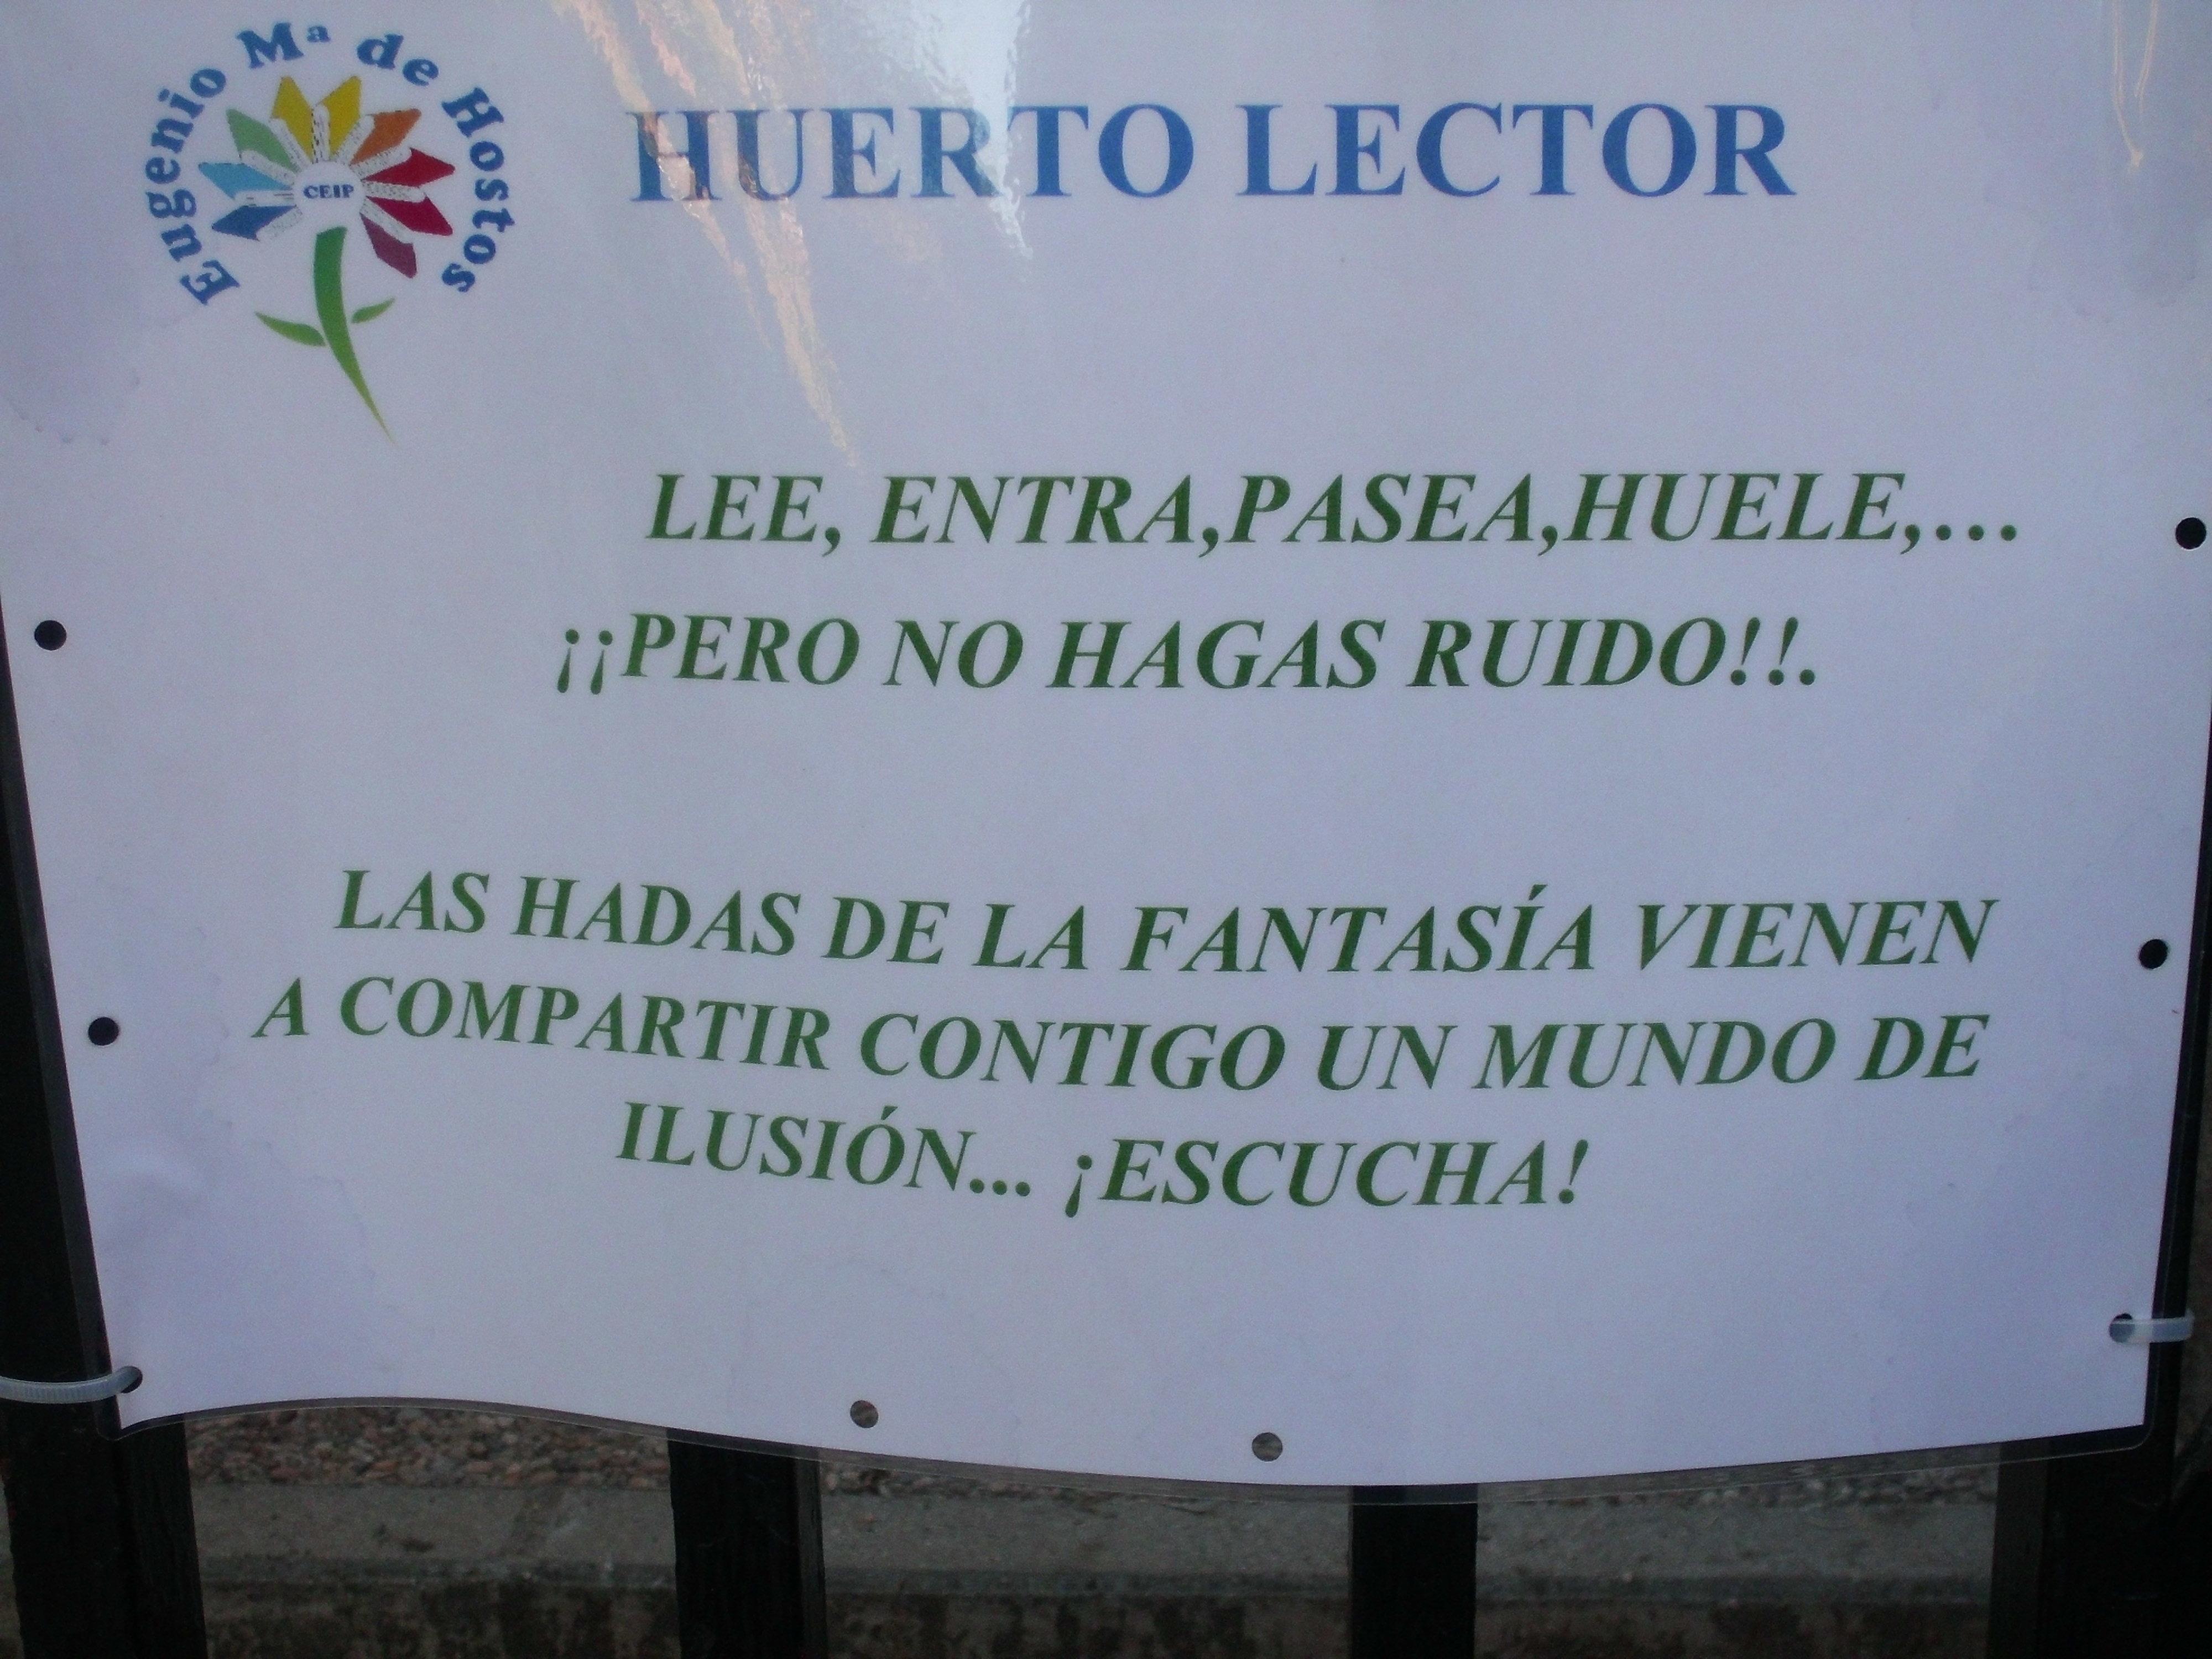 HUERTO LECTOR